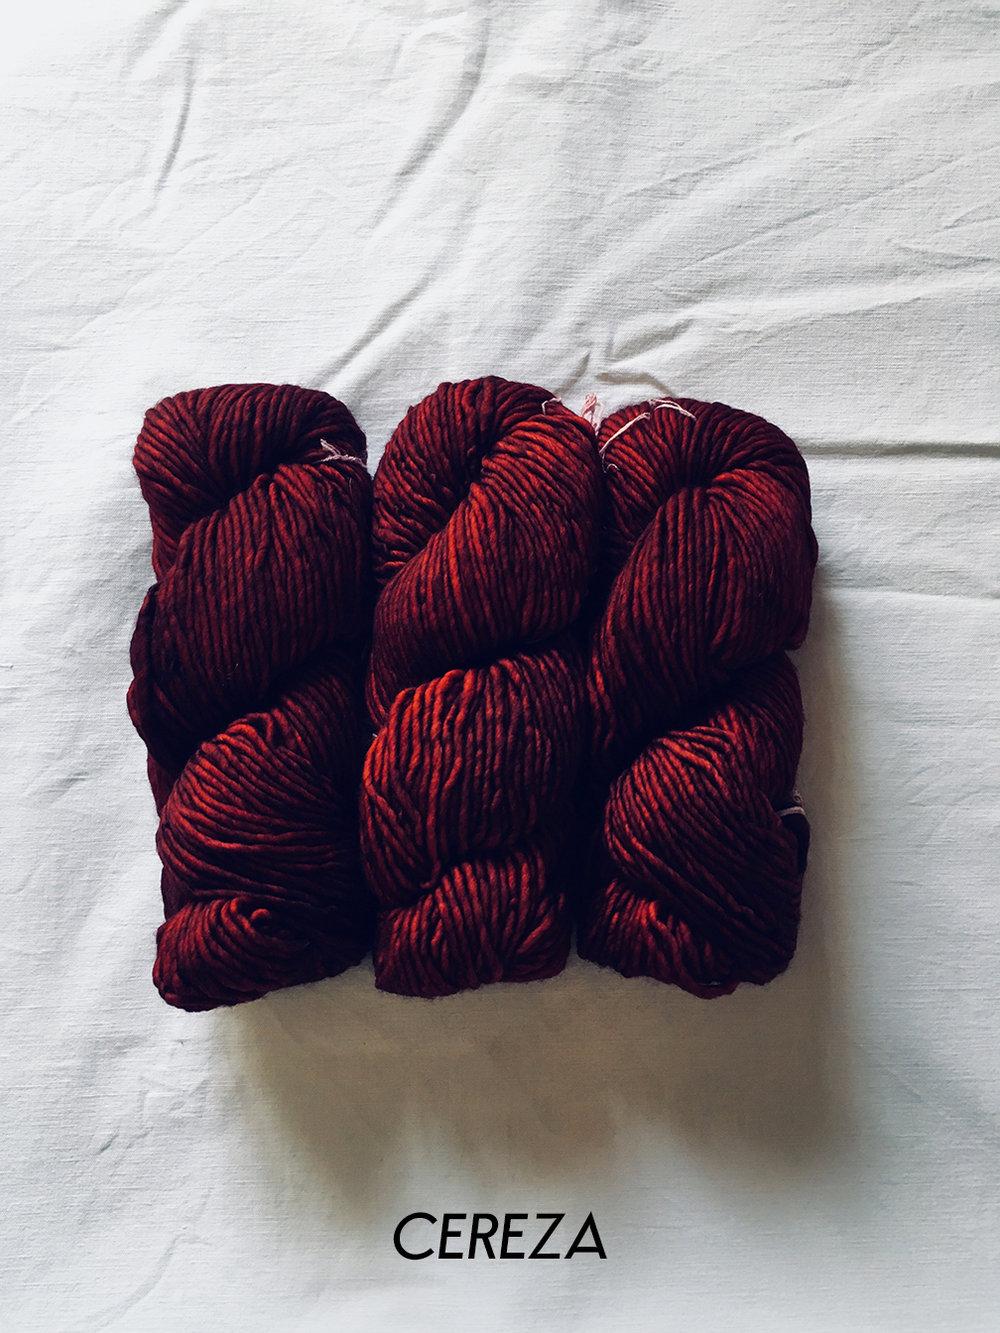 malabrigo_mecha_cereza_033_wool_done_knitting.jpg